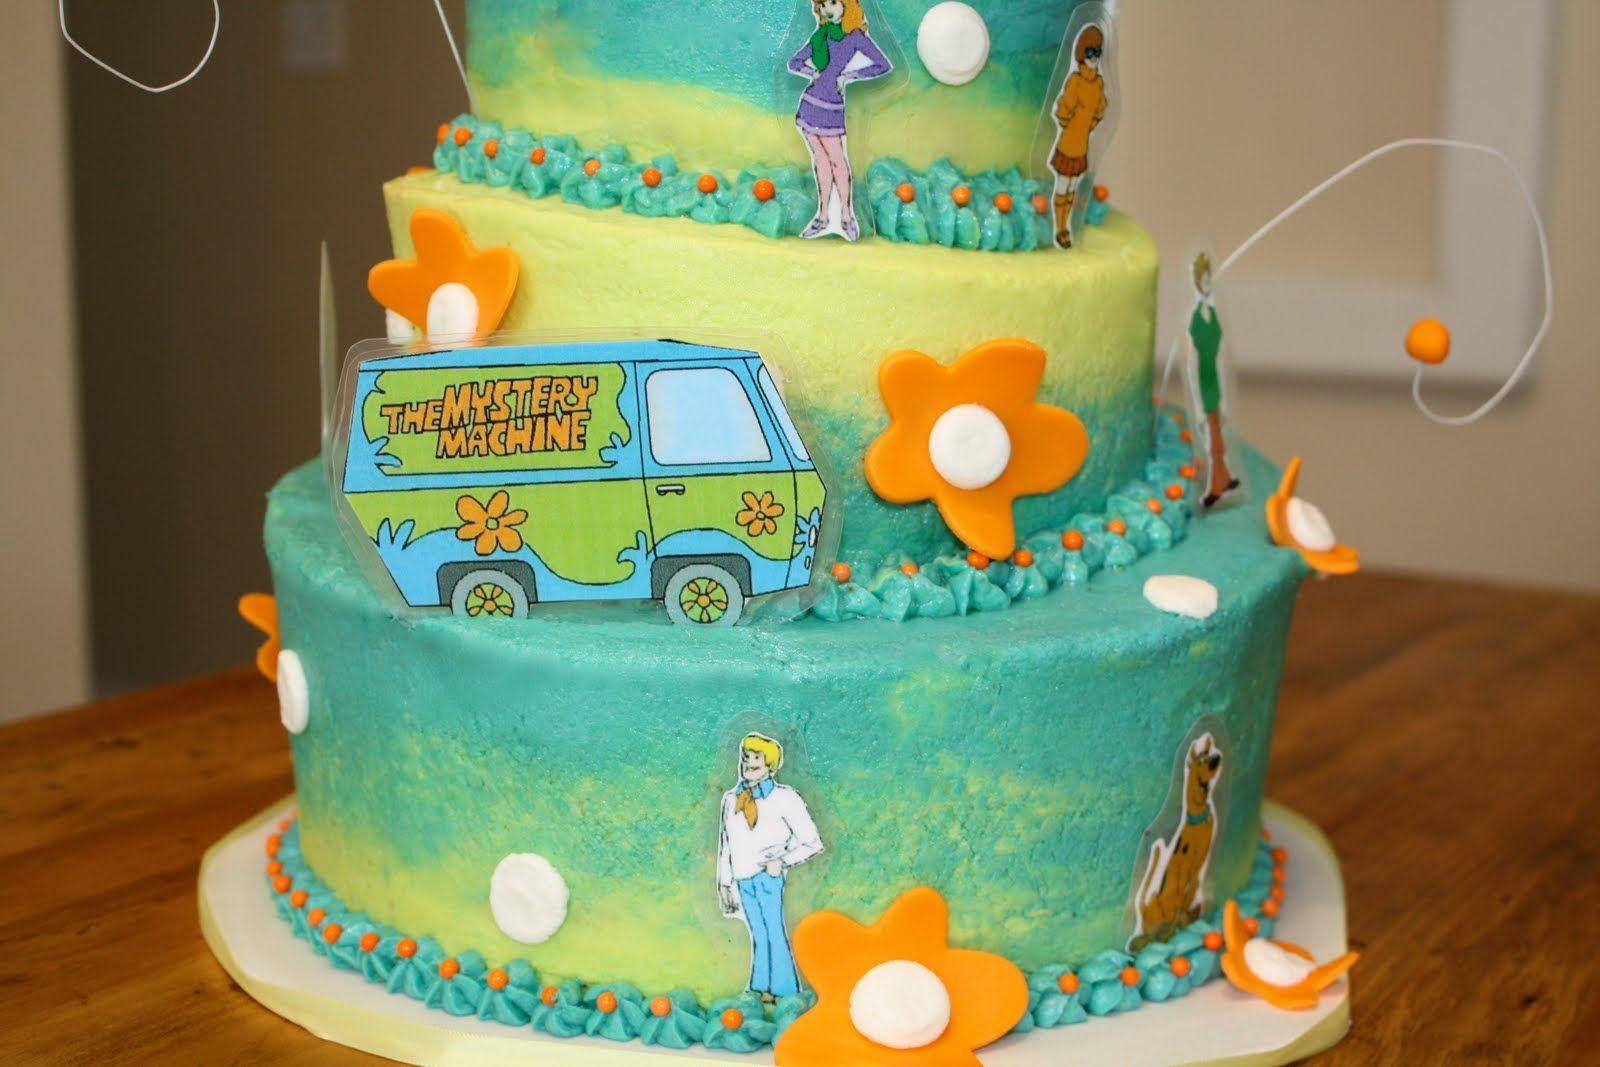 Marvelous Scooby Doo Birthday Cakes Bumble Cakes Scooby Doo Cake With Funny Birthday Cards Online Inifofree Goldxyz